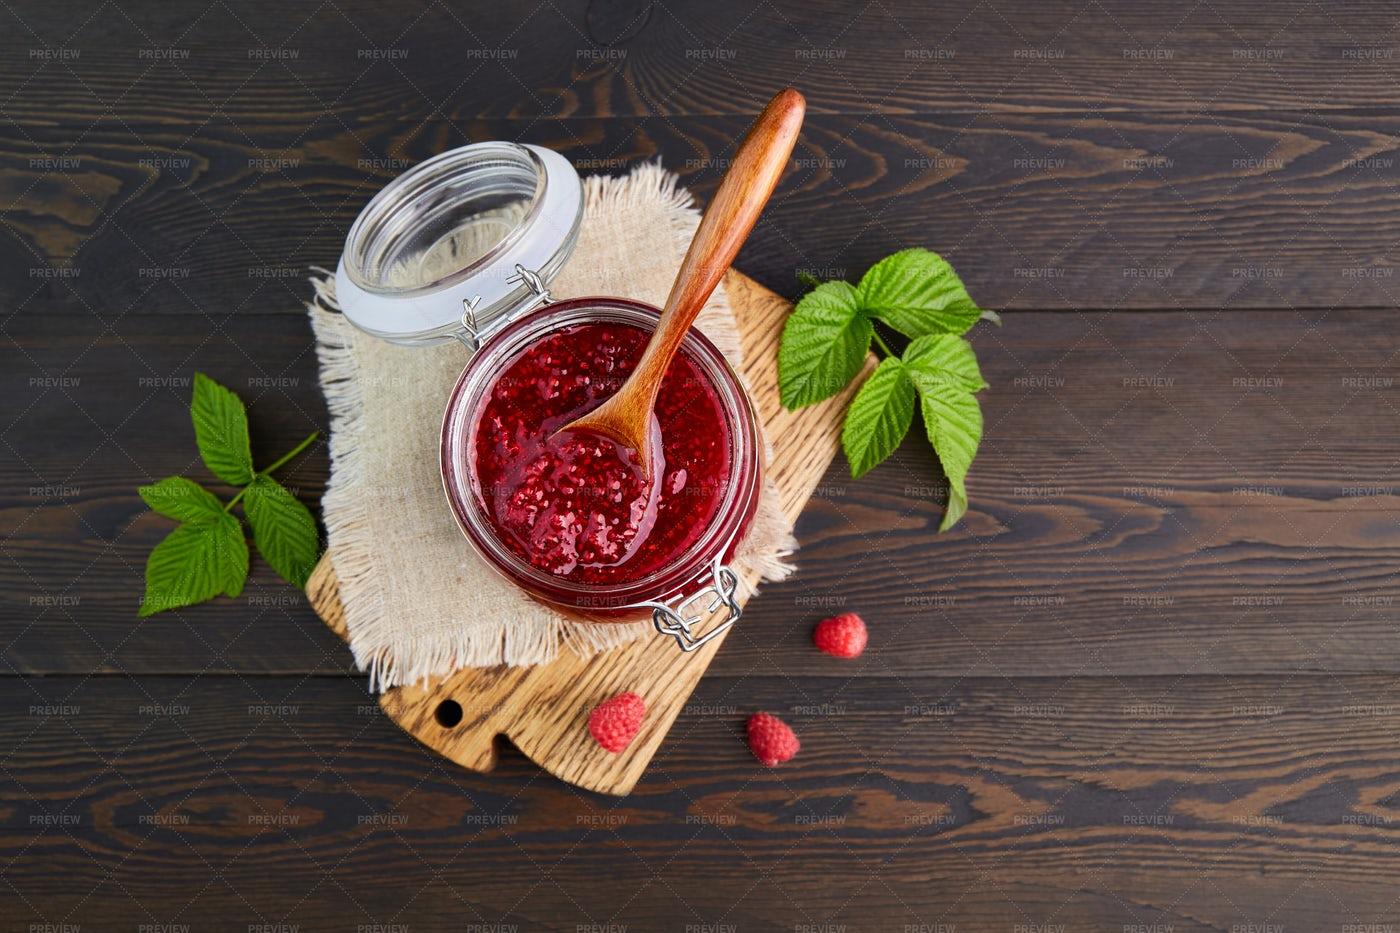 Raspberry Jam In A  Jar: Stock Photos